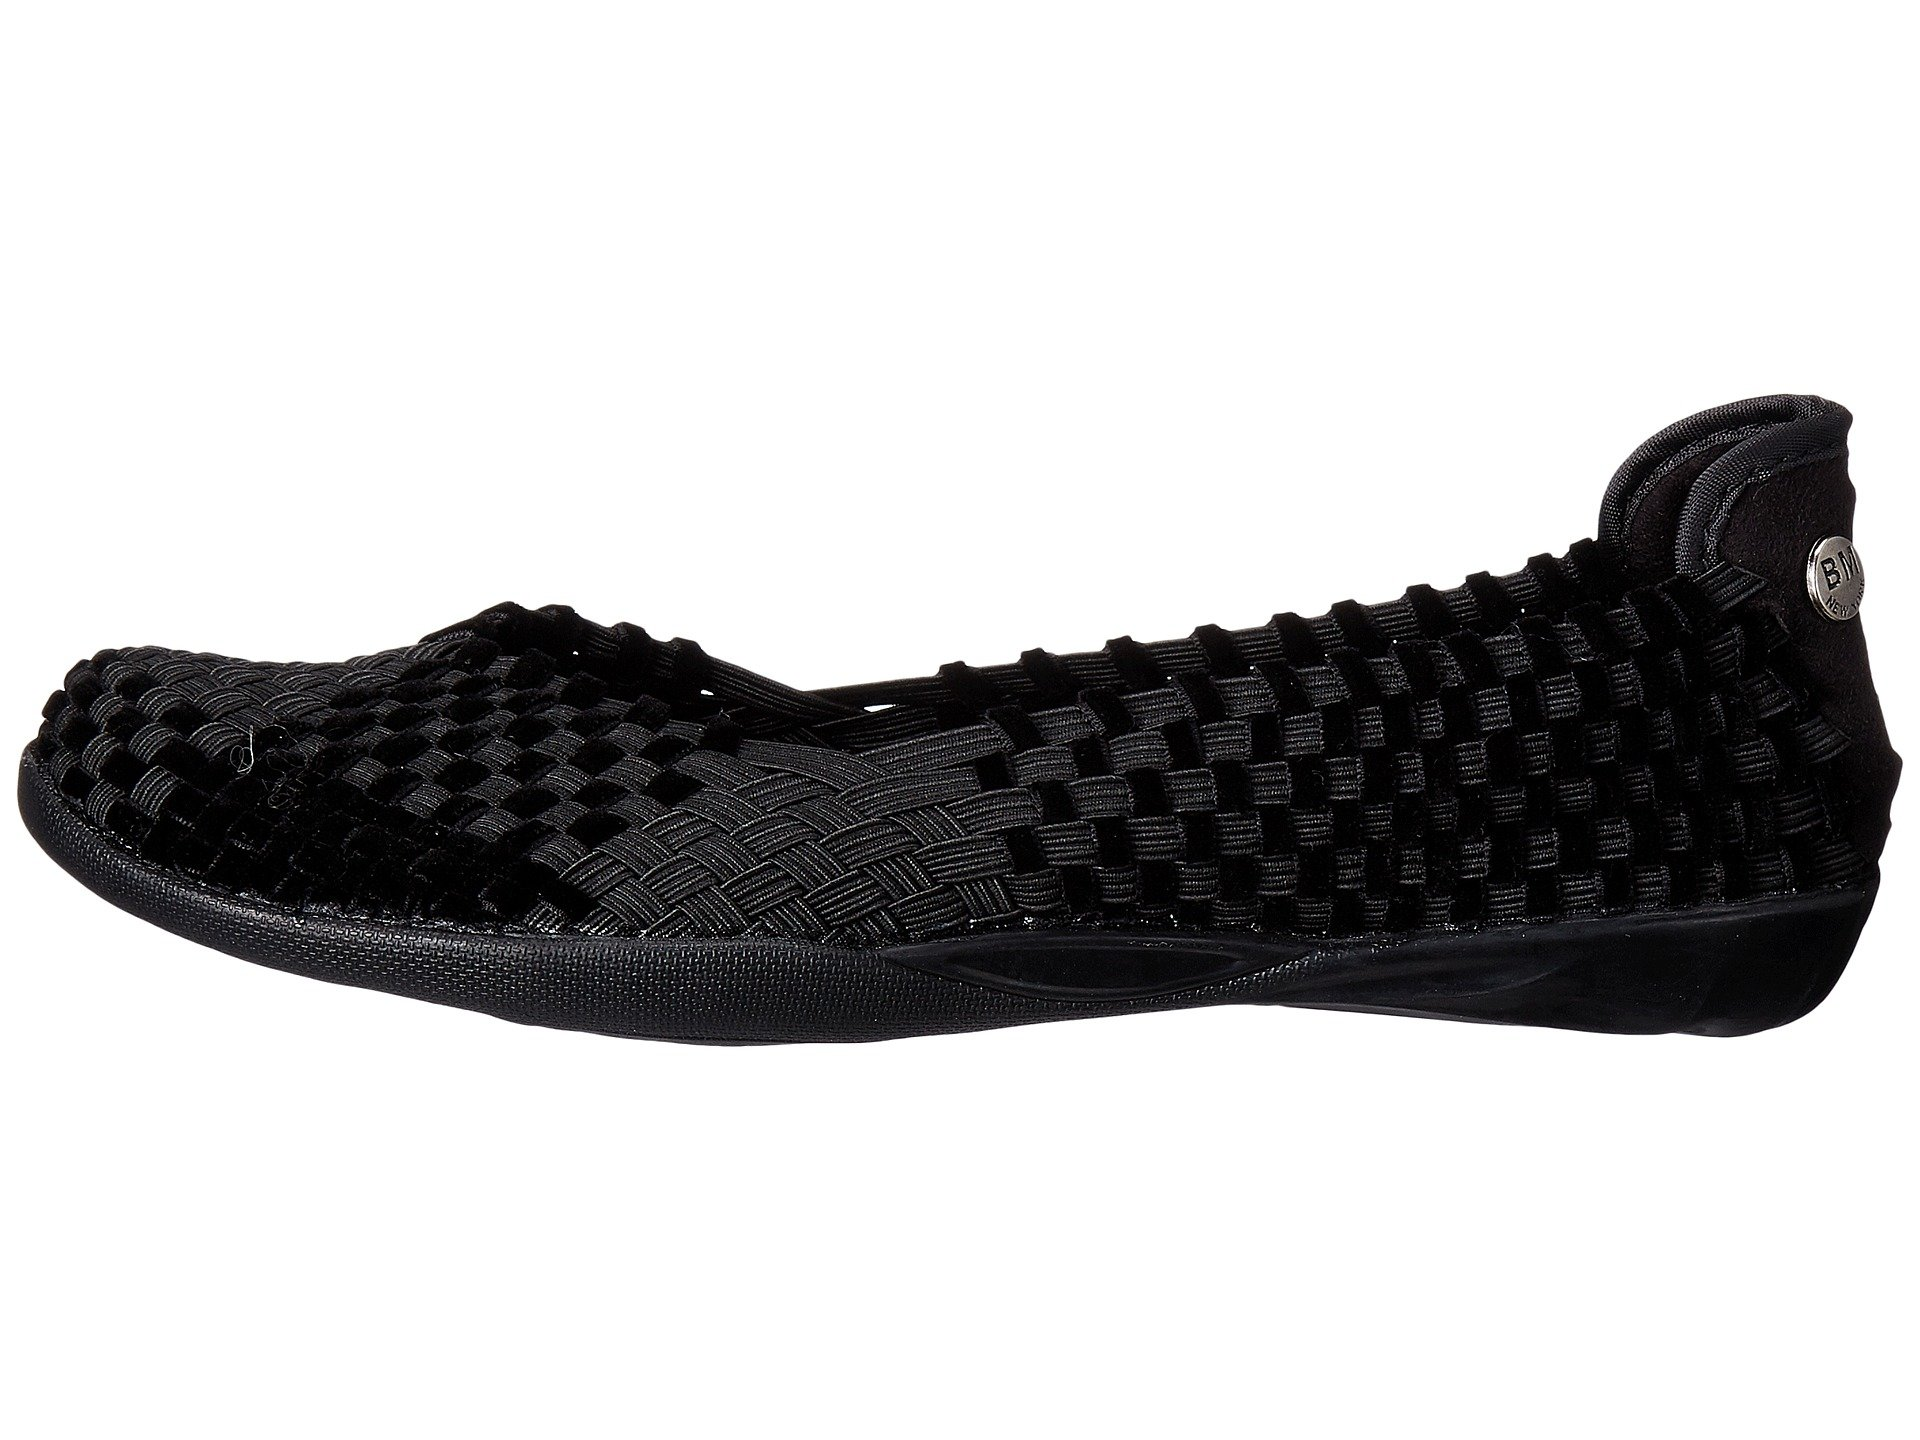 Bernie Mev Shoes Catwalk Women S Size  Black Silver